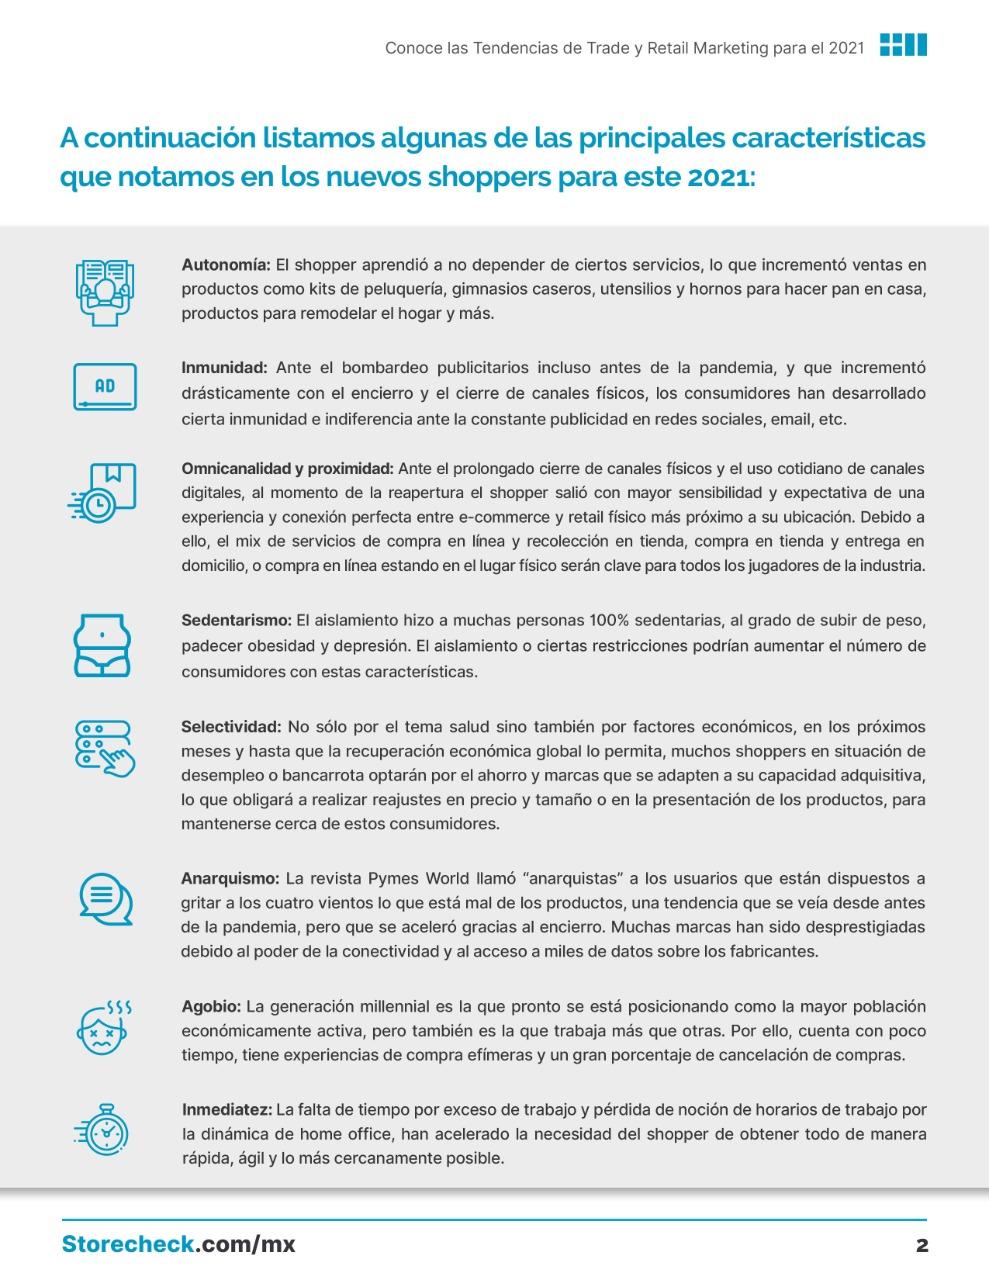 Ebook-Storecheck-tendencias-post-covid-19-pag-5